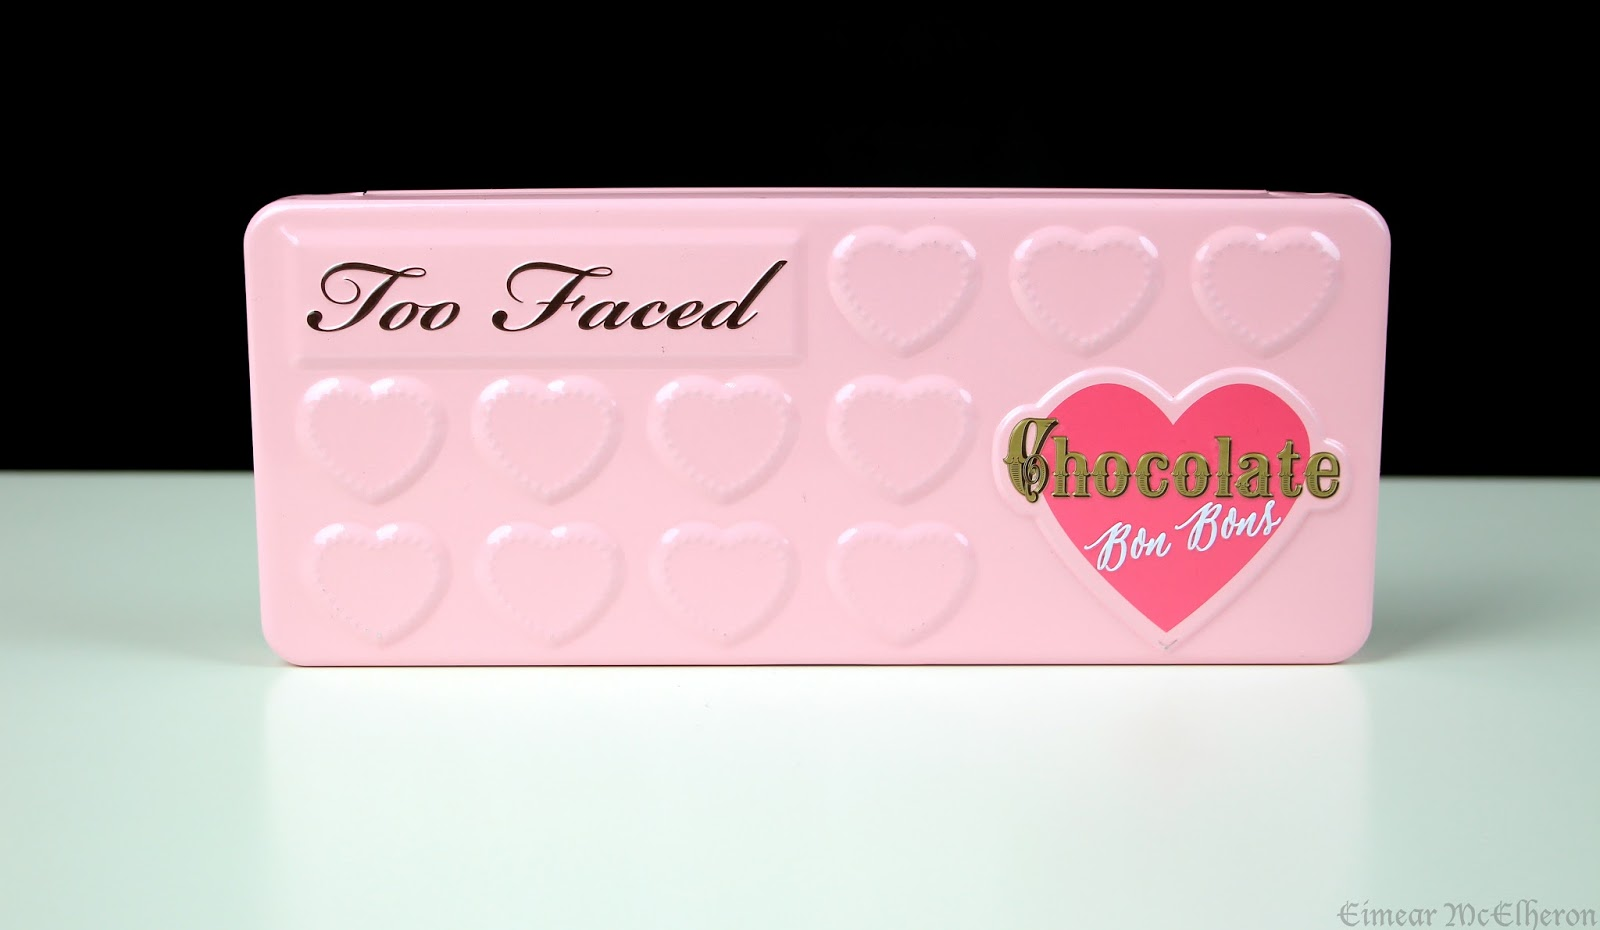 Eimear McElheron : Too Faced Chocolate Bon Bons Palette | Review ...